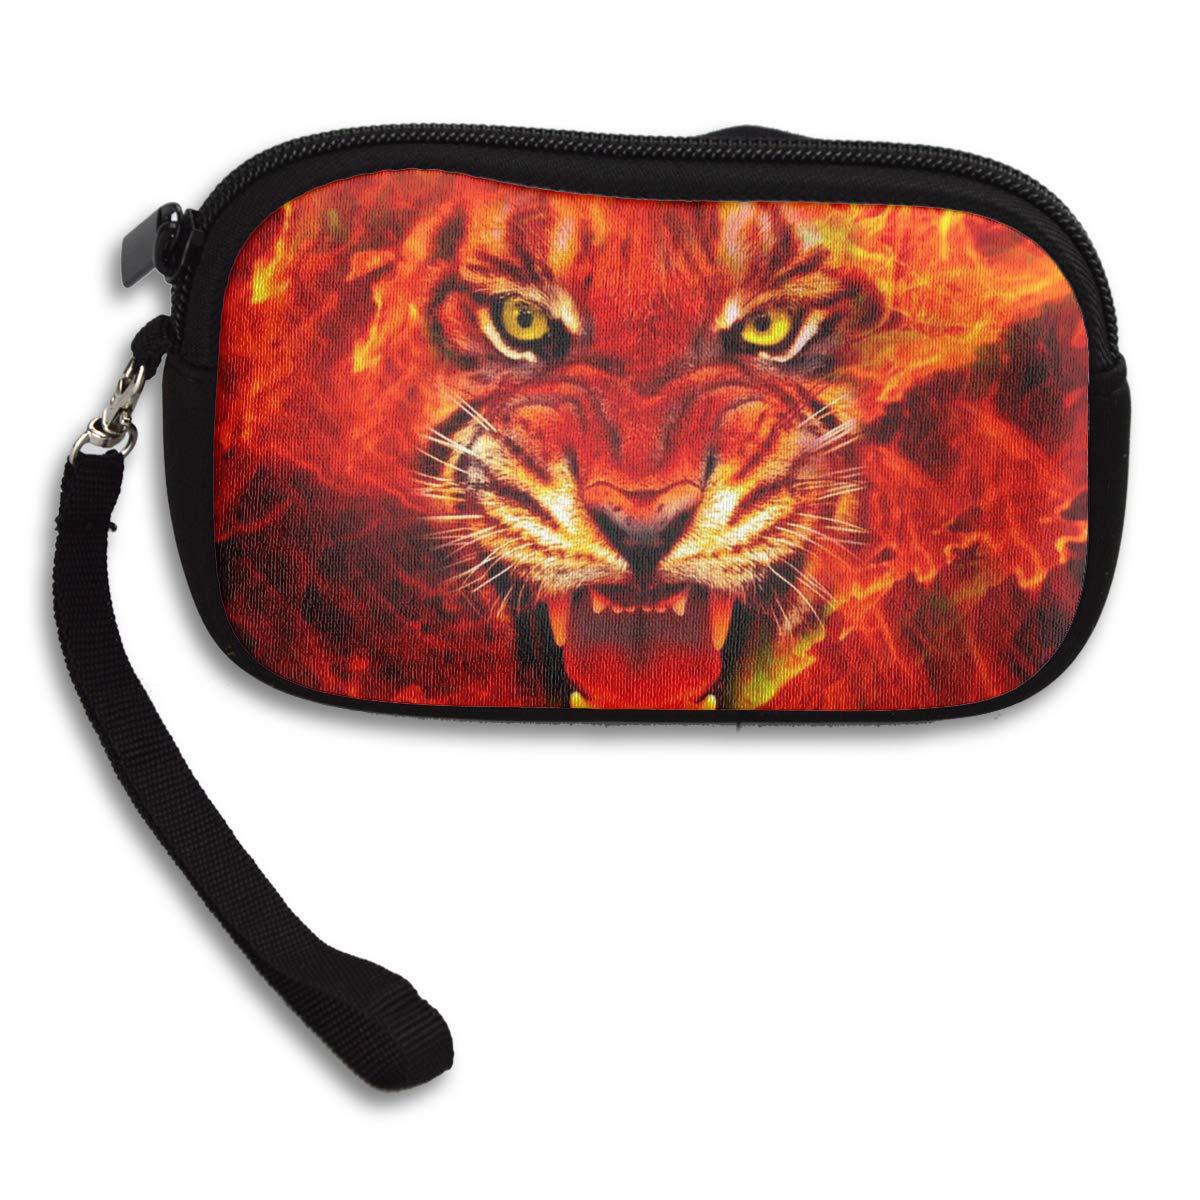 Fire King Tiger Face Coin Pouch Clutch Purse Wristlet Wallet Phone Card Holder Handbag